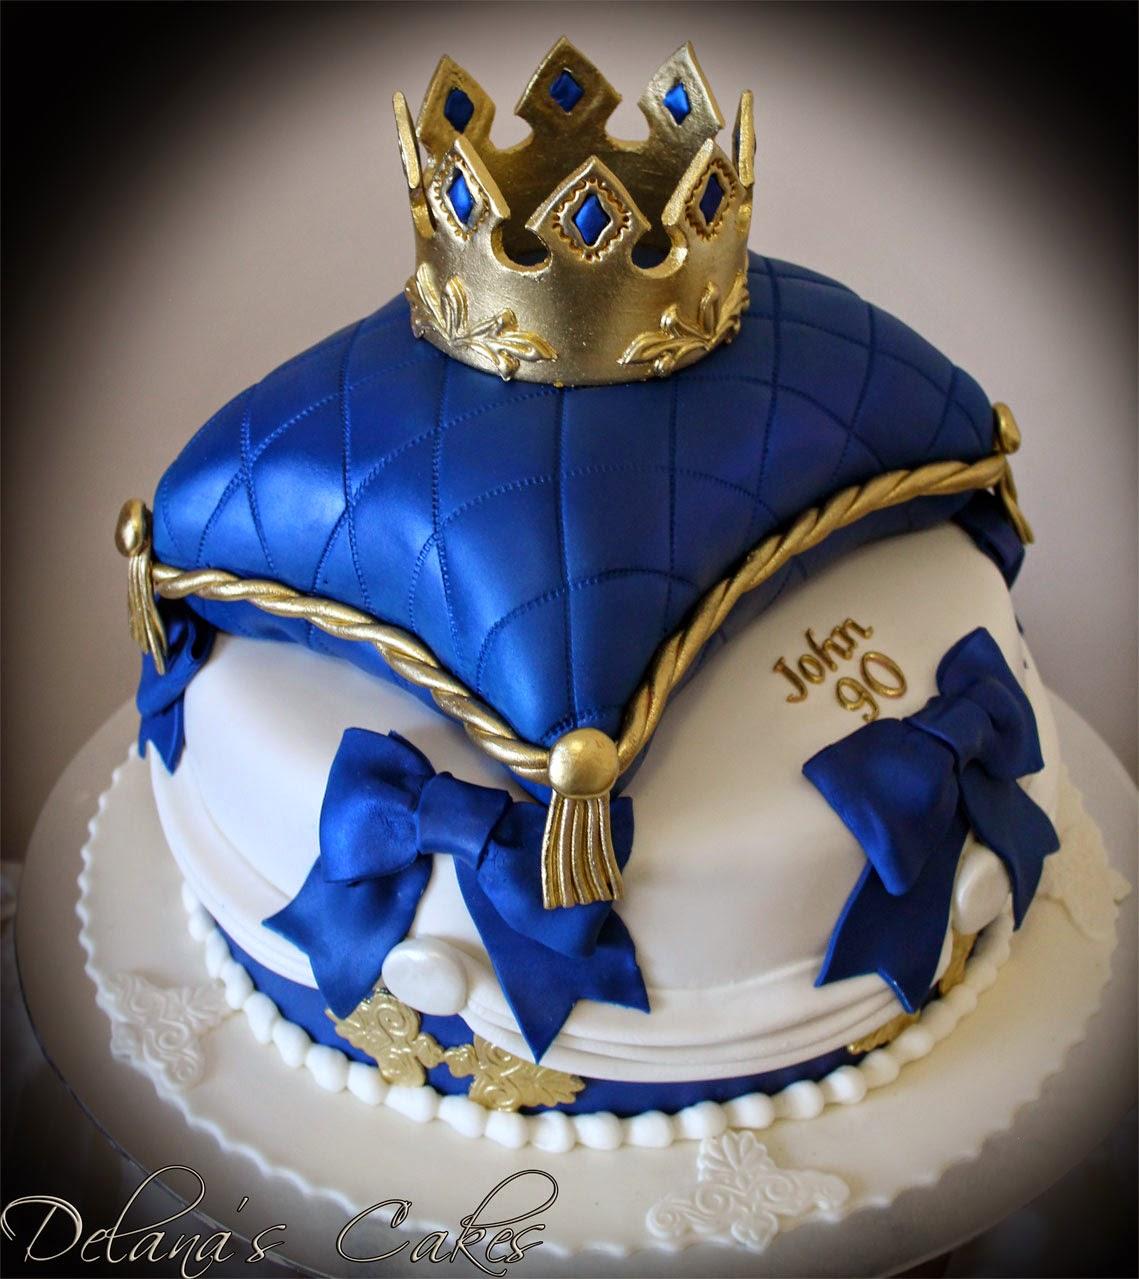 Delanas Cakes Royal Crown Pillow Cake